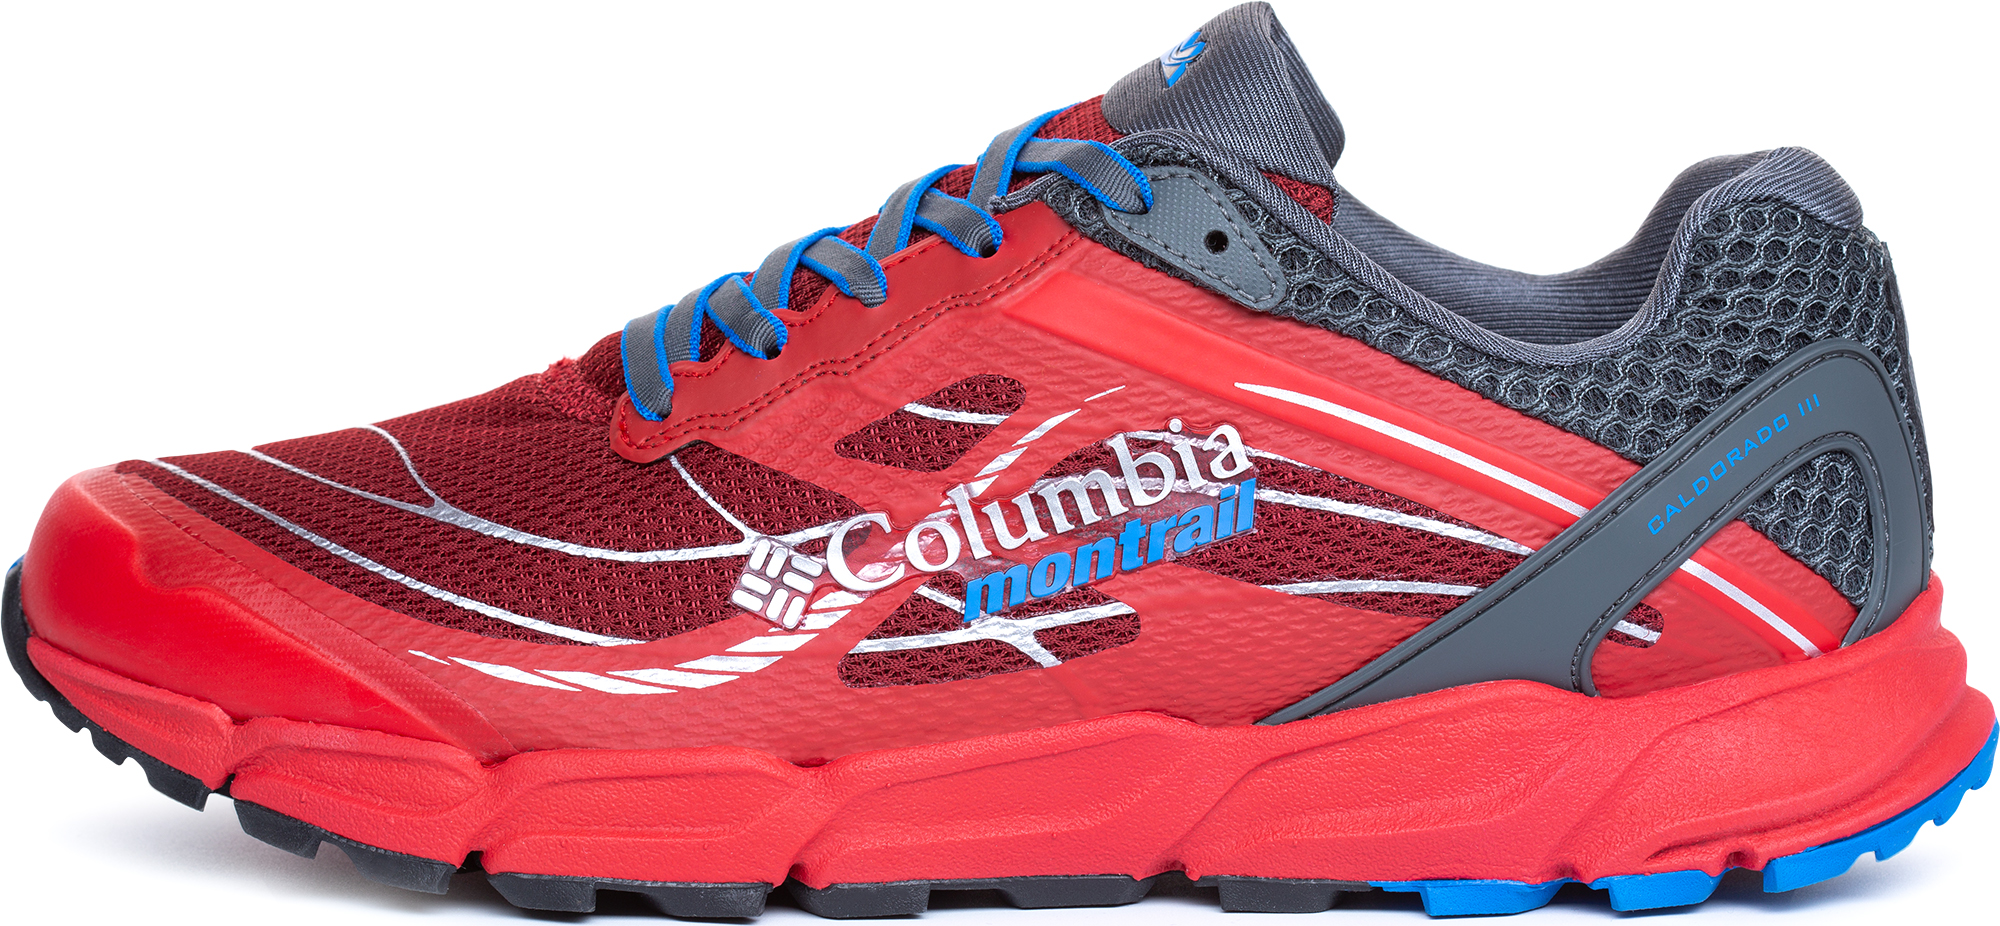 Columbia Кроссовки мужские Columbia Caldorado III, размер 44